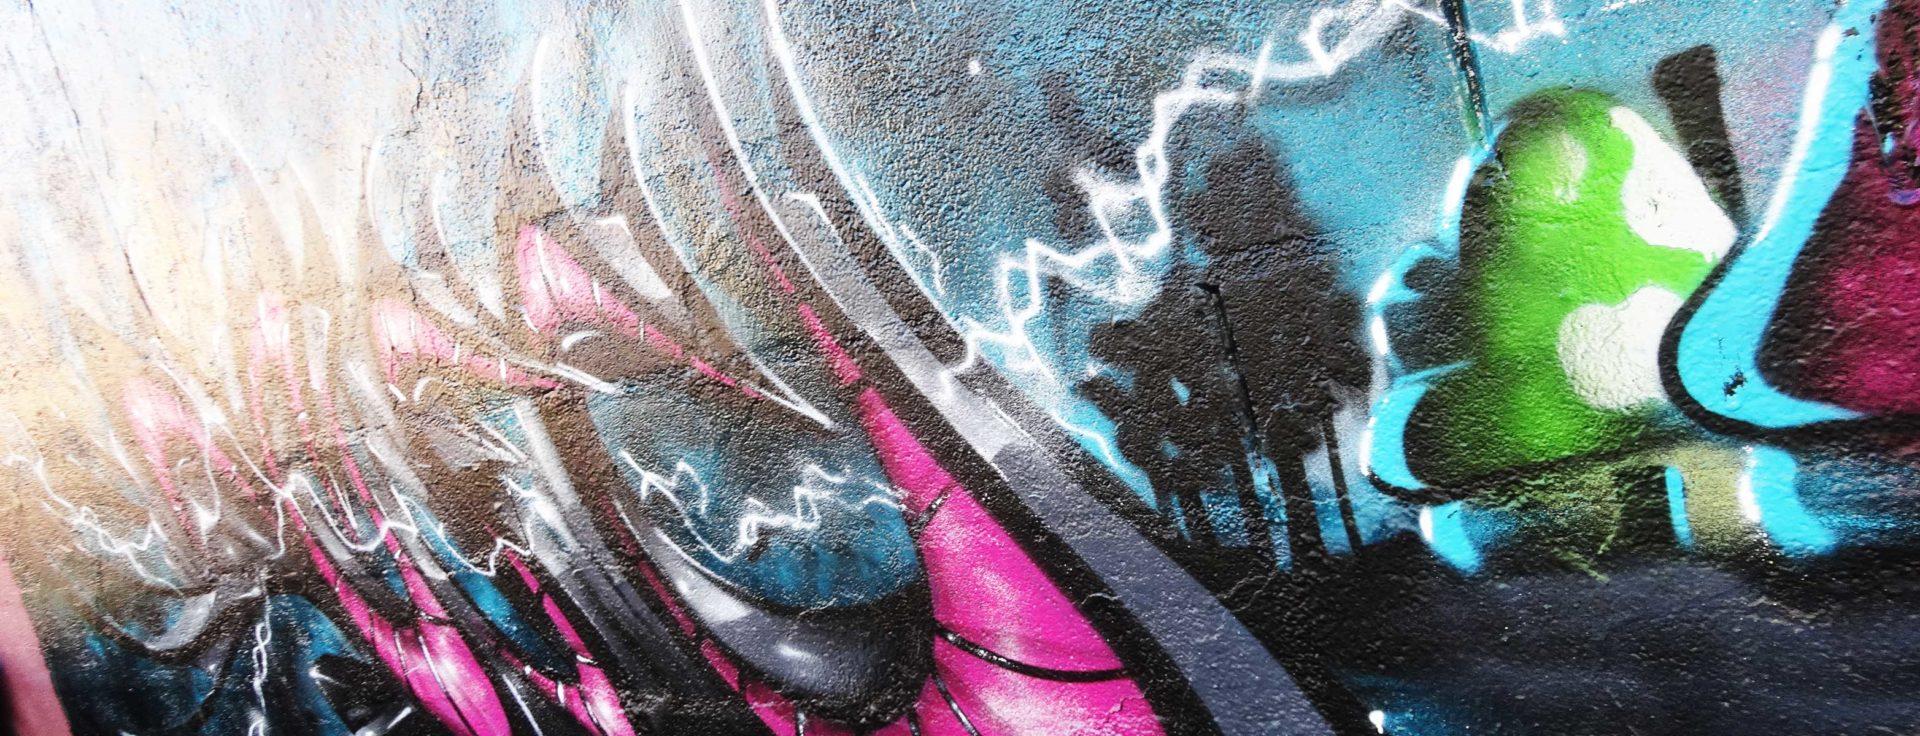 graffiti_Schroumph_deft_2013_2